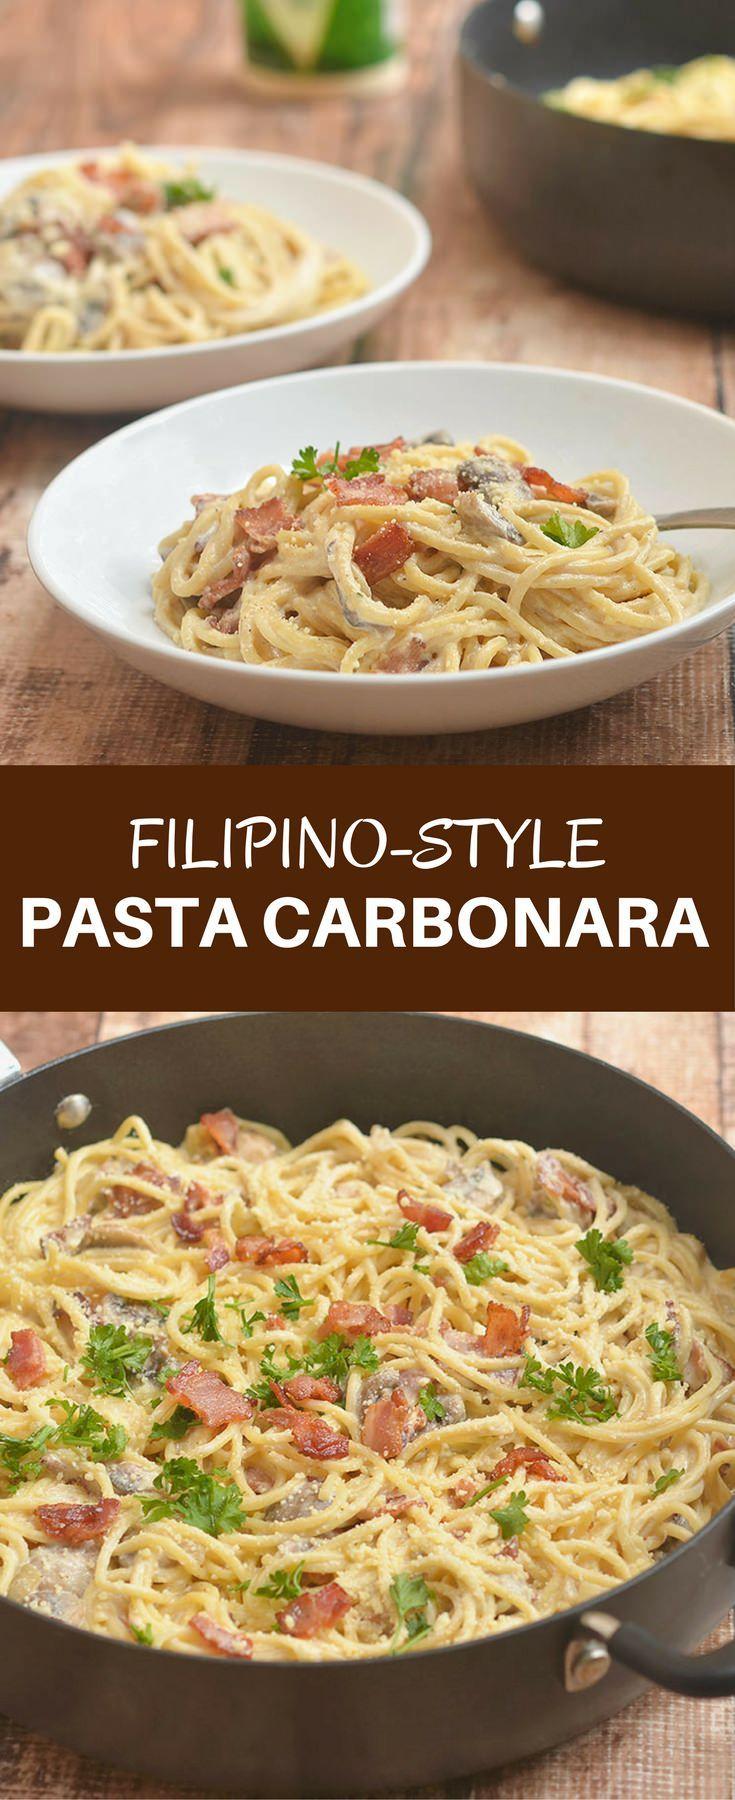 Filipino-style Pasta Carbonara